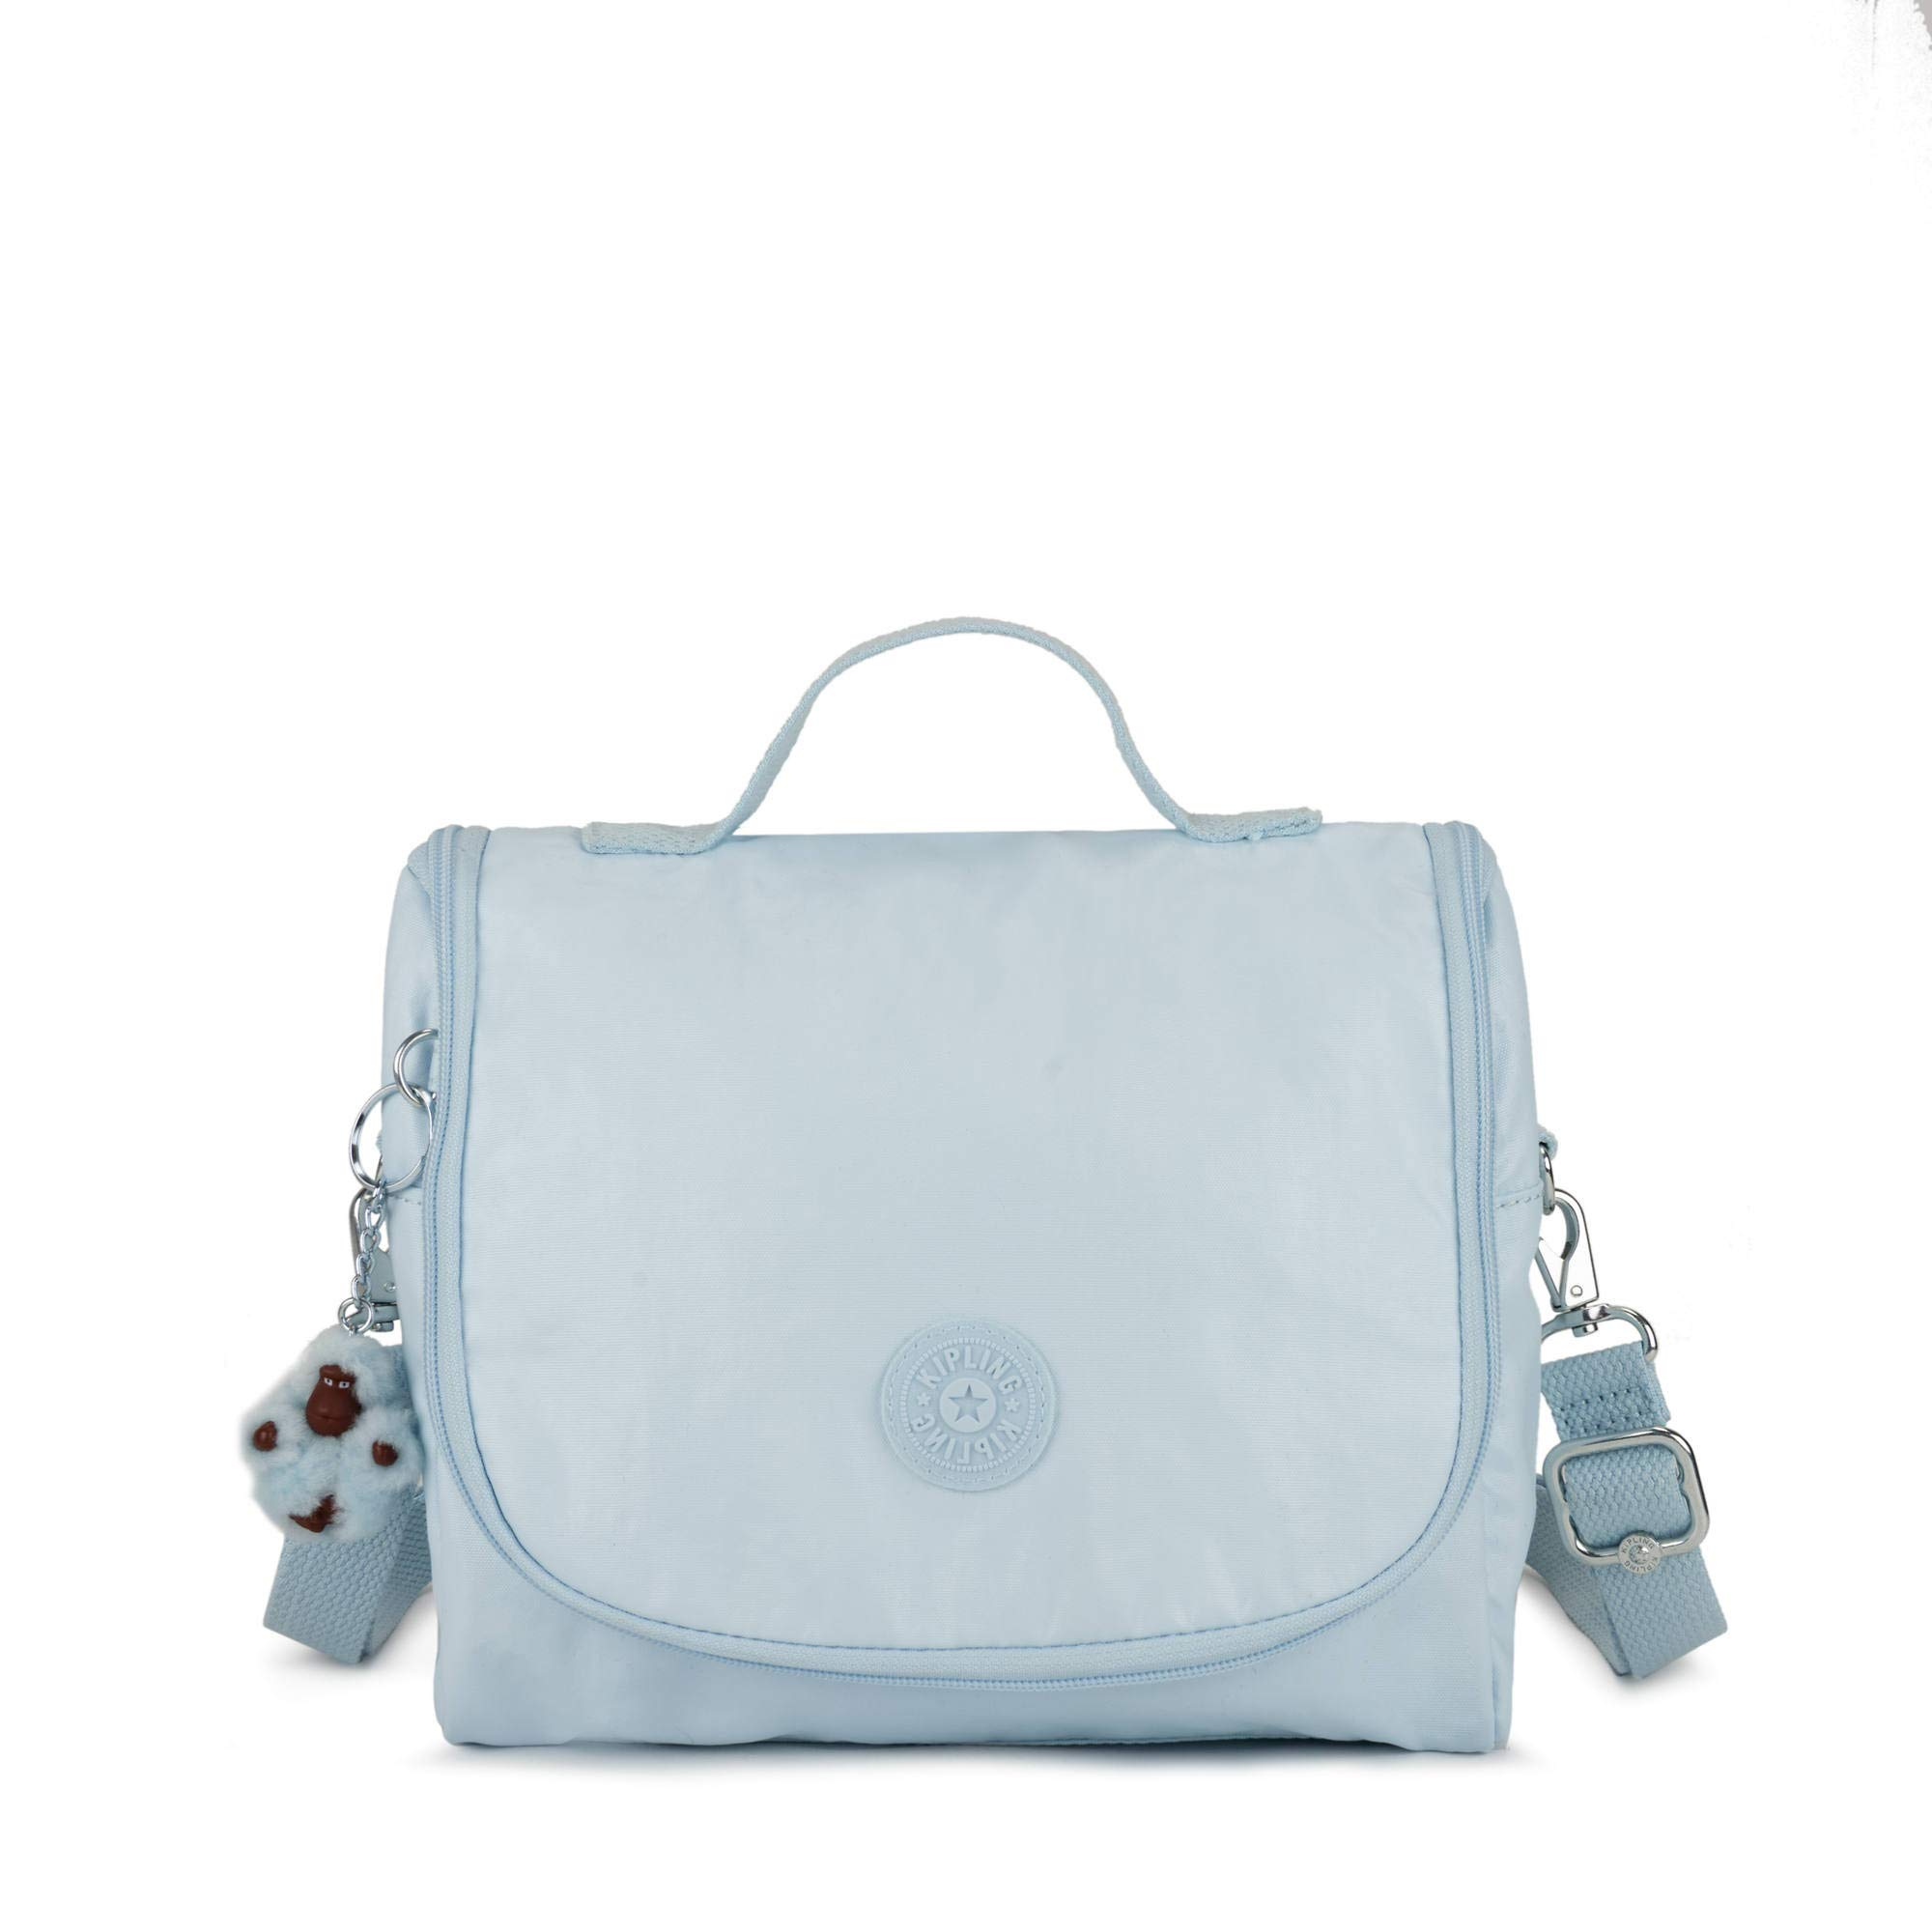 Kipling Kichirou Metallic Lunch Bag One Size Fainted Blue Mtlc